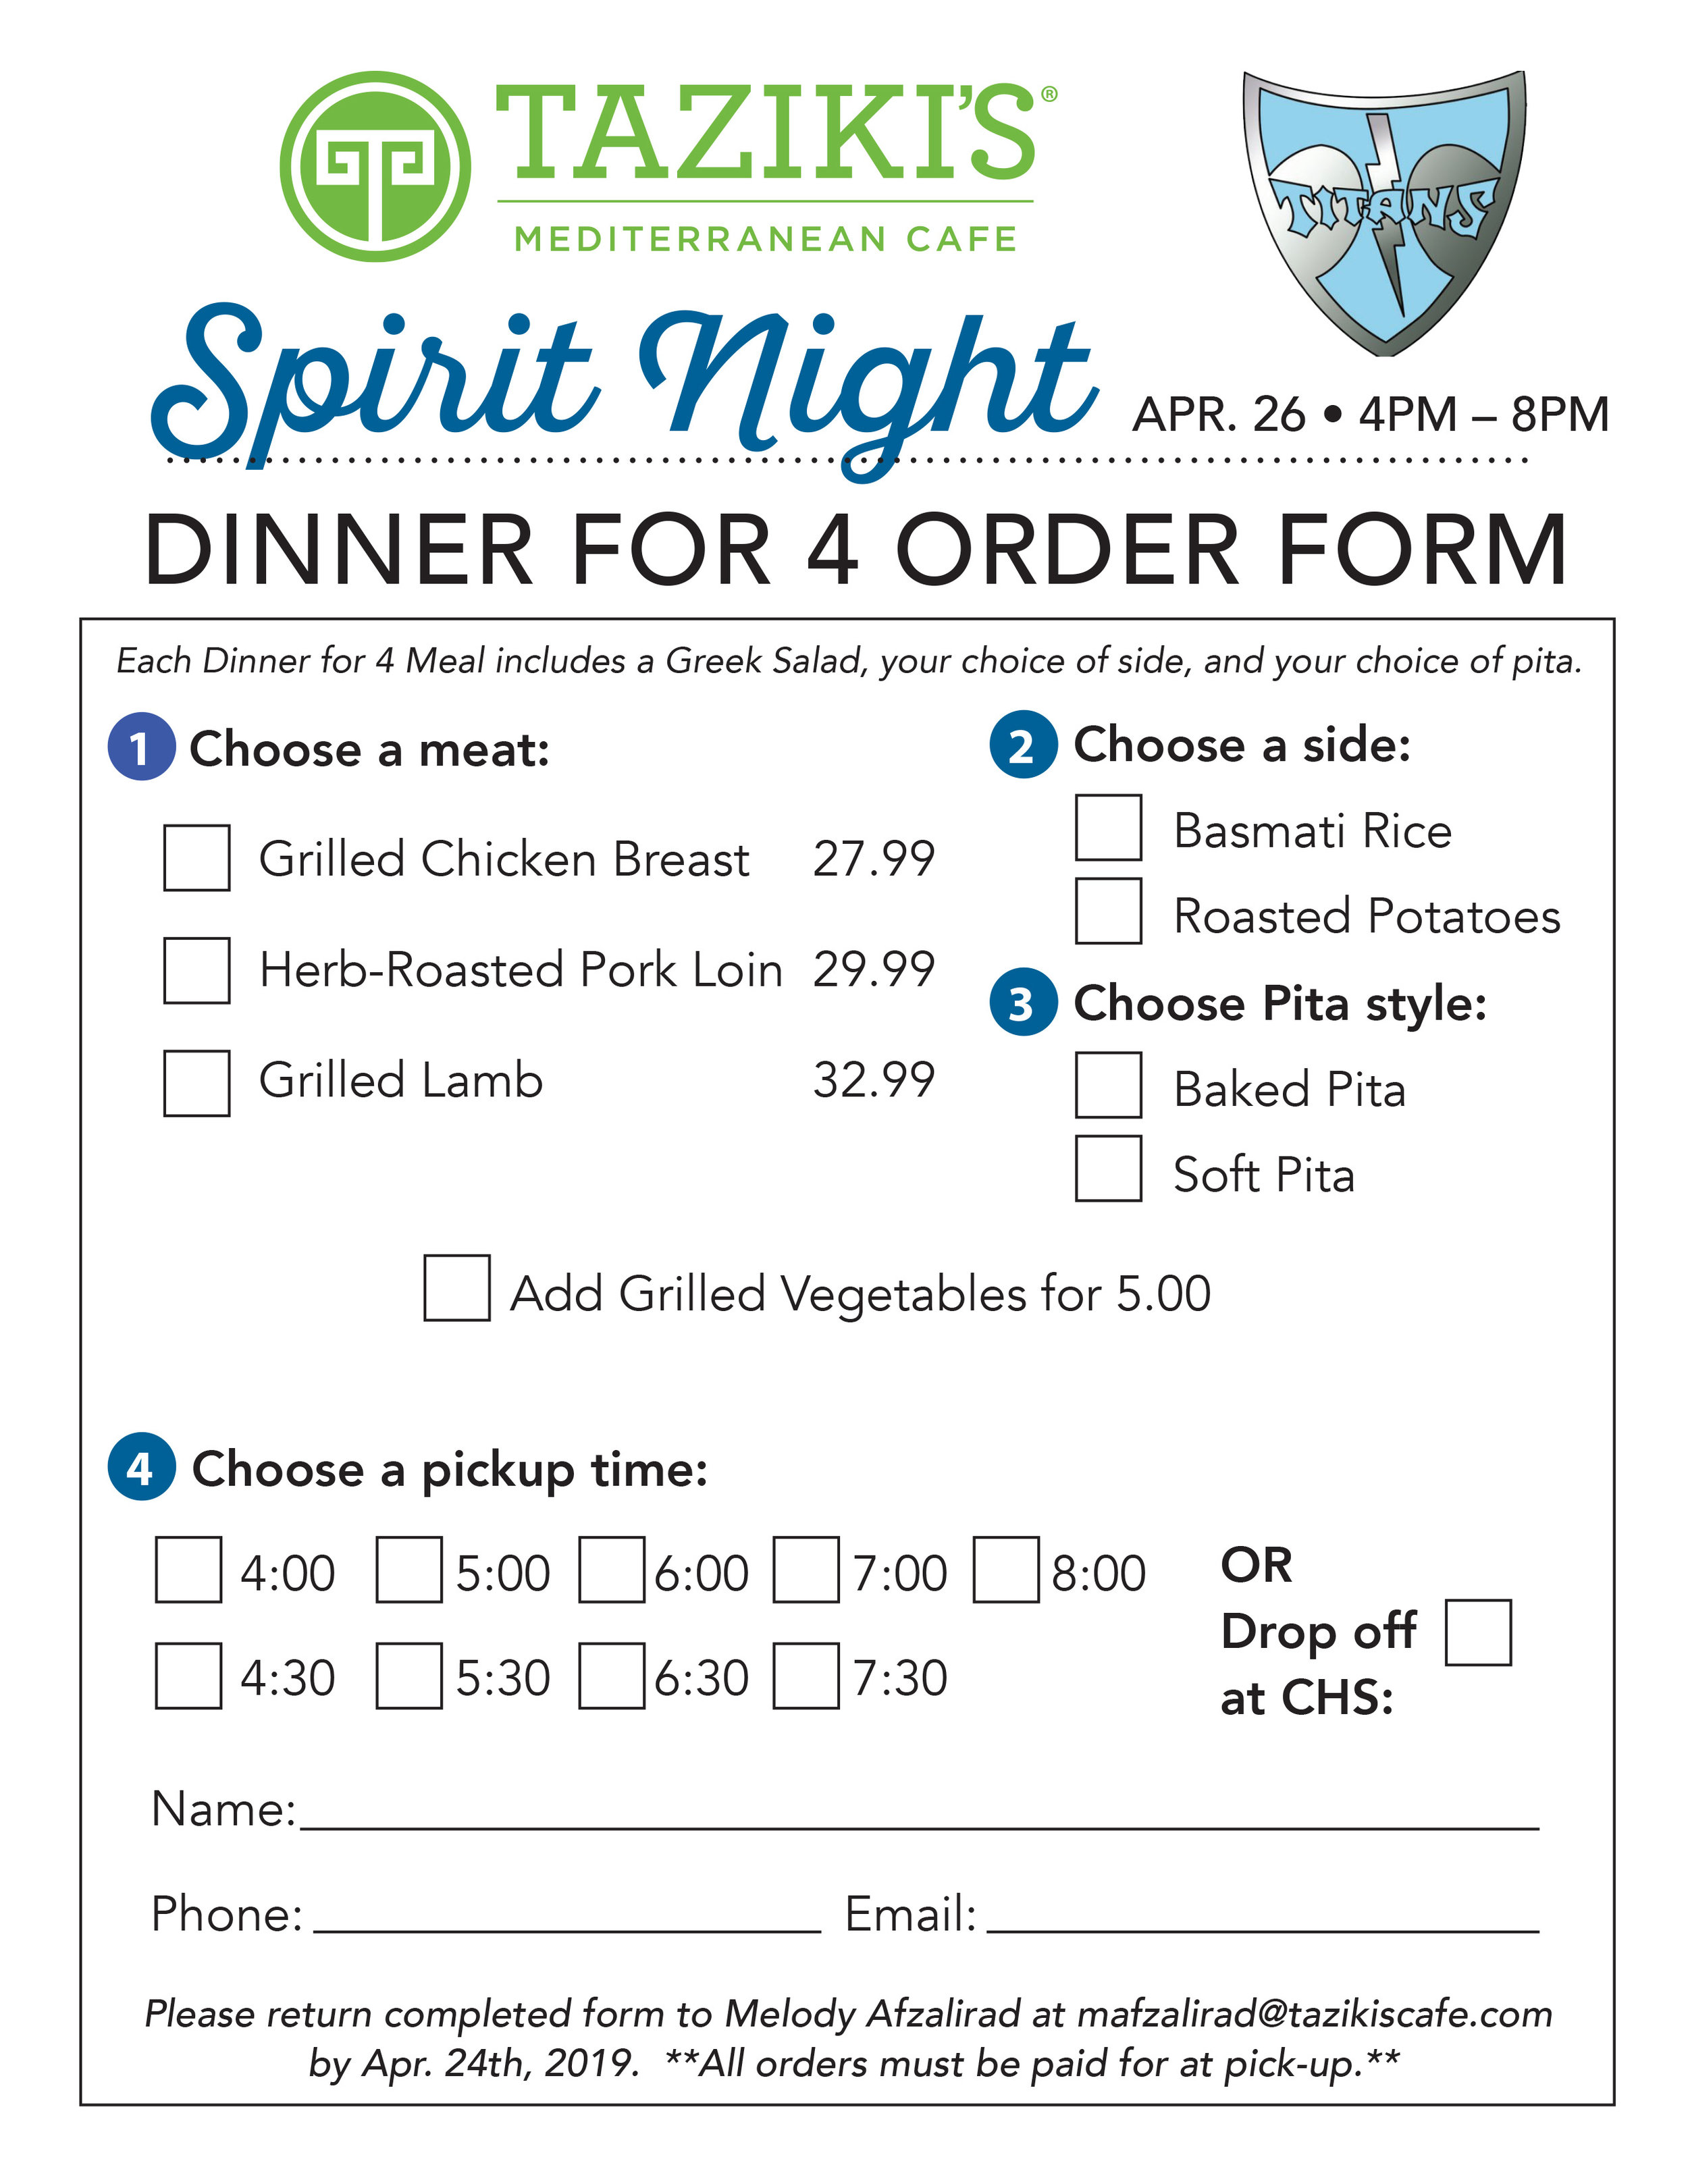 Tazikis Cosby HS Spirit Night Order Form-full.jpg